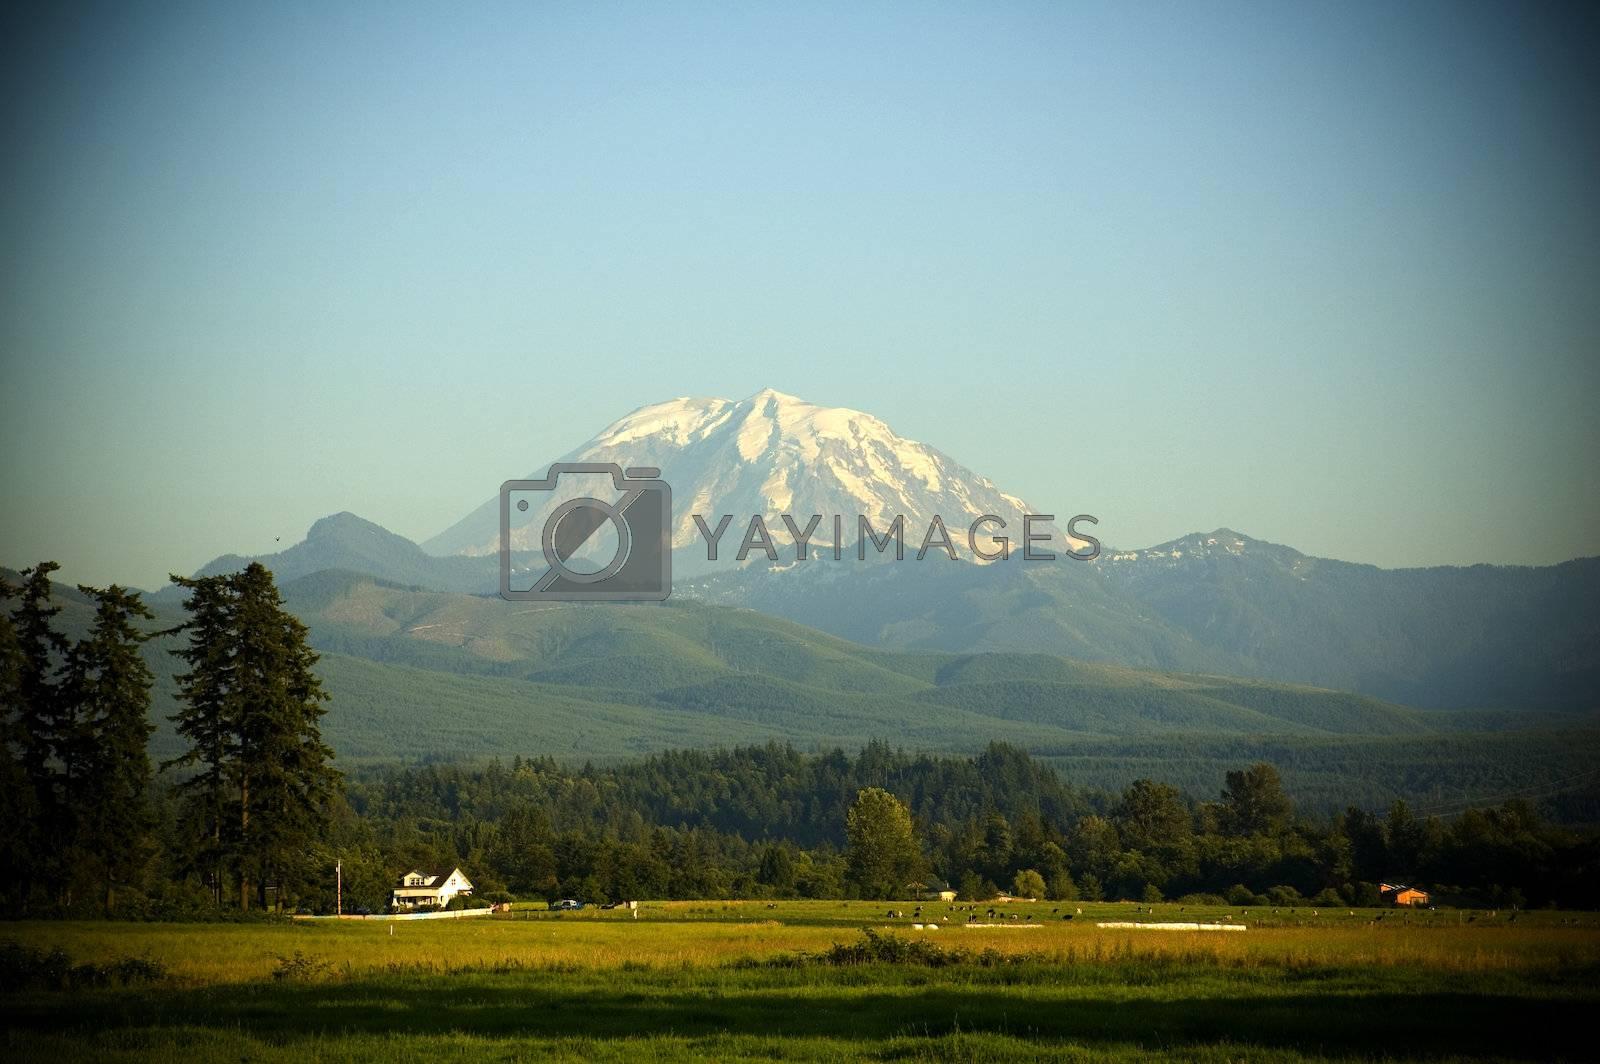 Mount Rainier towers over a picturesque farm with farmhouse and cattle near Enumclaw, Washington.